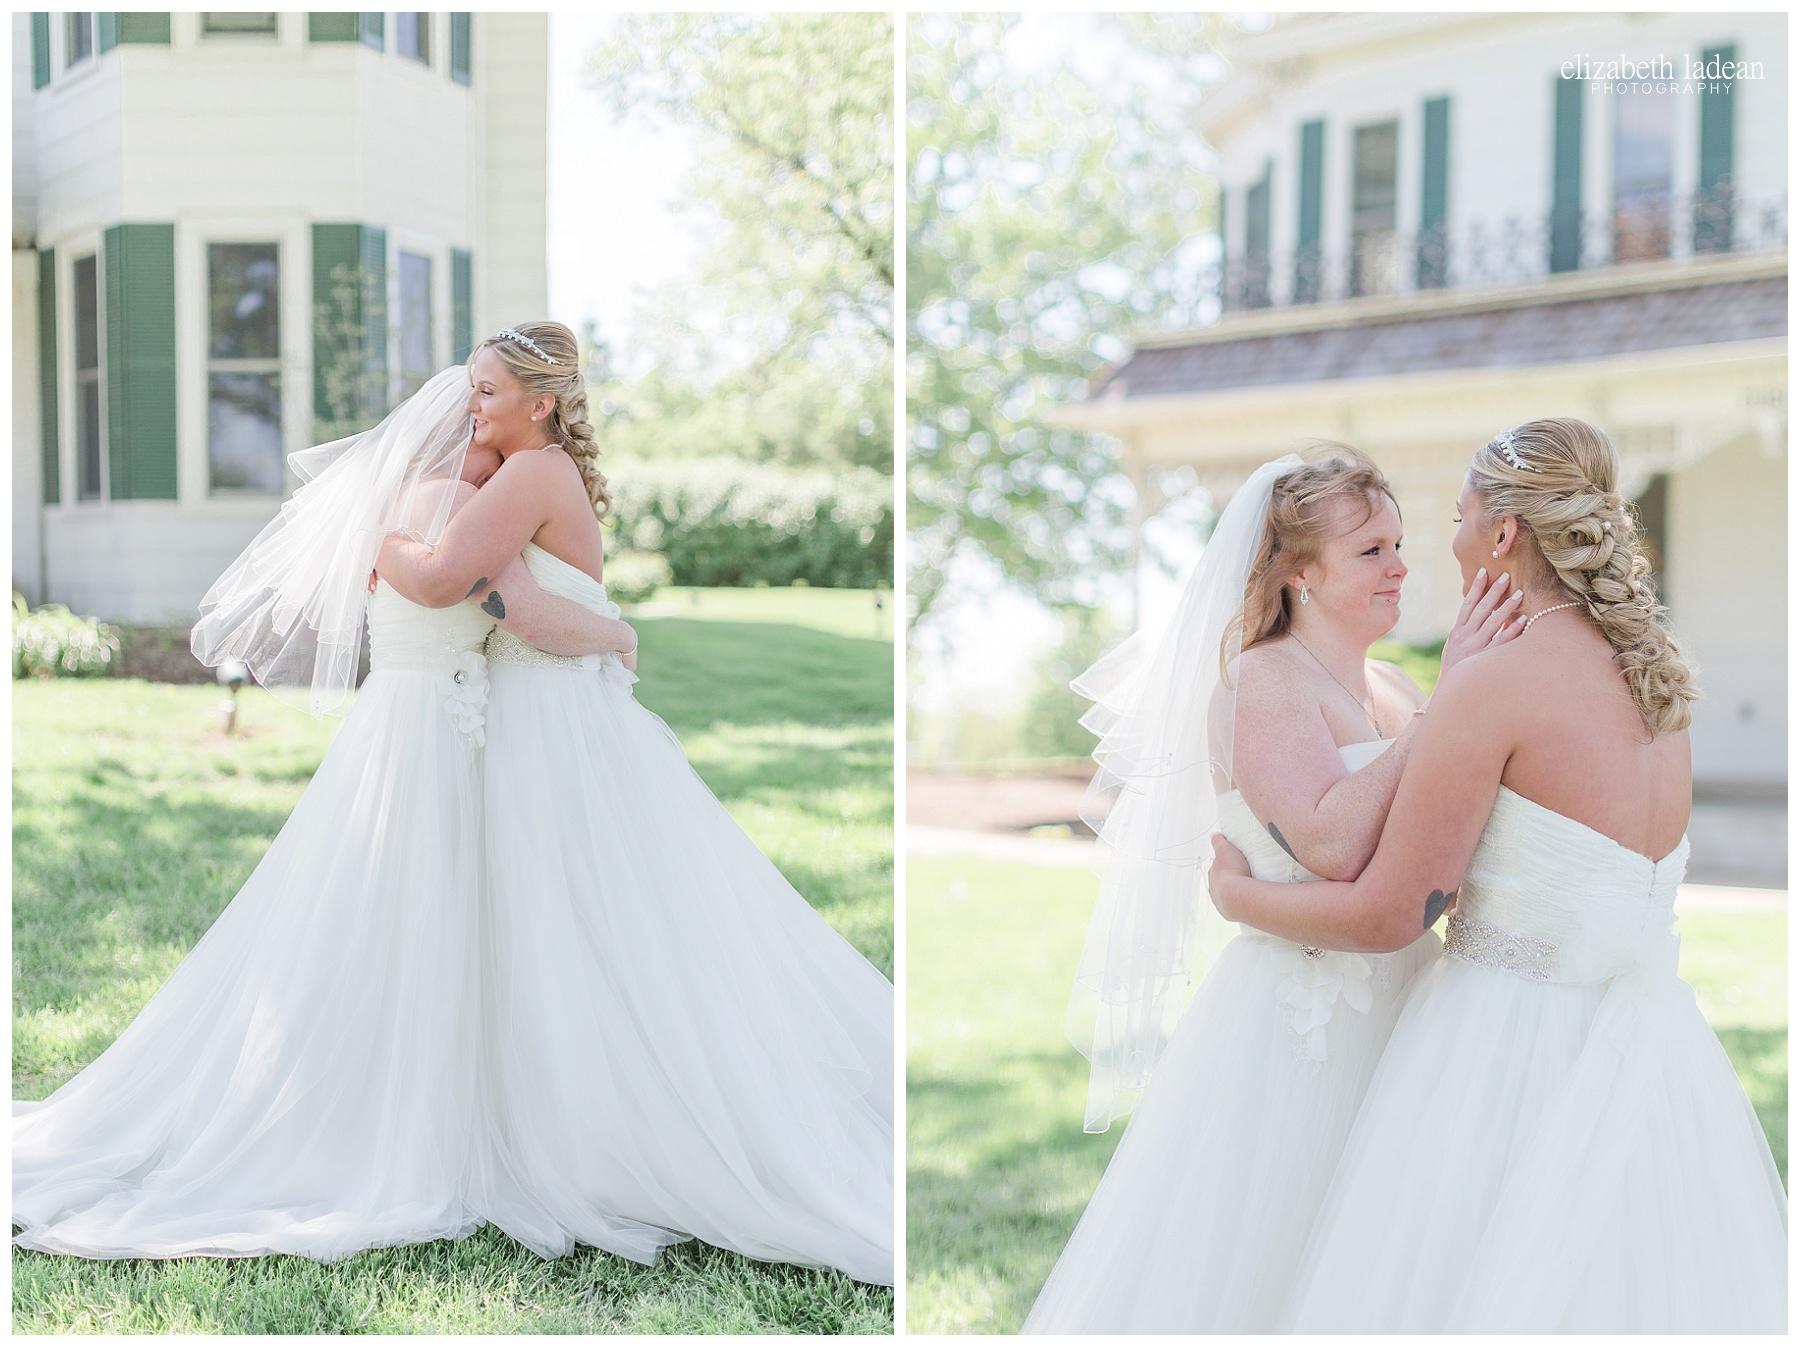 Thompson-Barn-Kansas-Wedding-Photography-R+J-0505-Elizabeth-Ladean-Photography-photo_0677.jpg